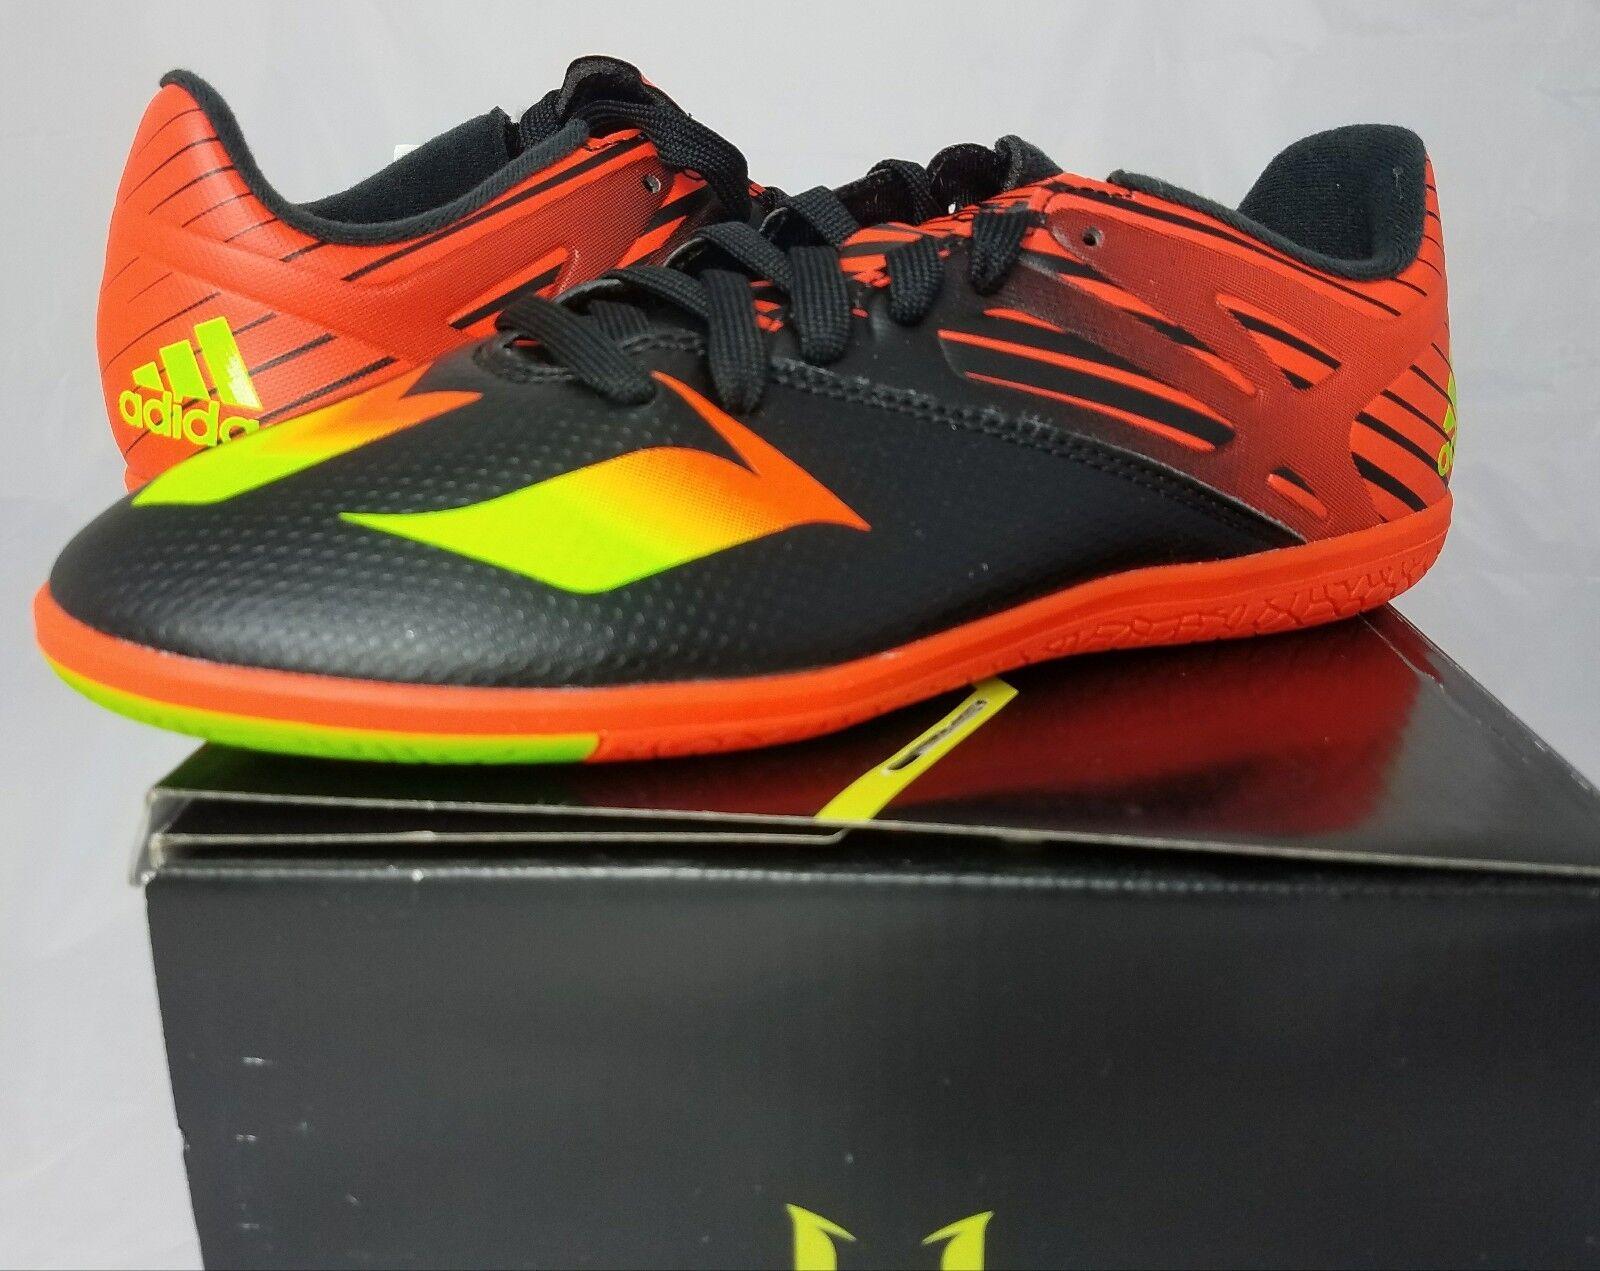 2147901e47fc Junior Shoes Football adidas Messi 15.3 in Jr Af4847 UK 4 for sale ...